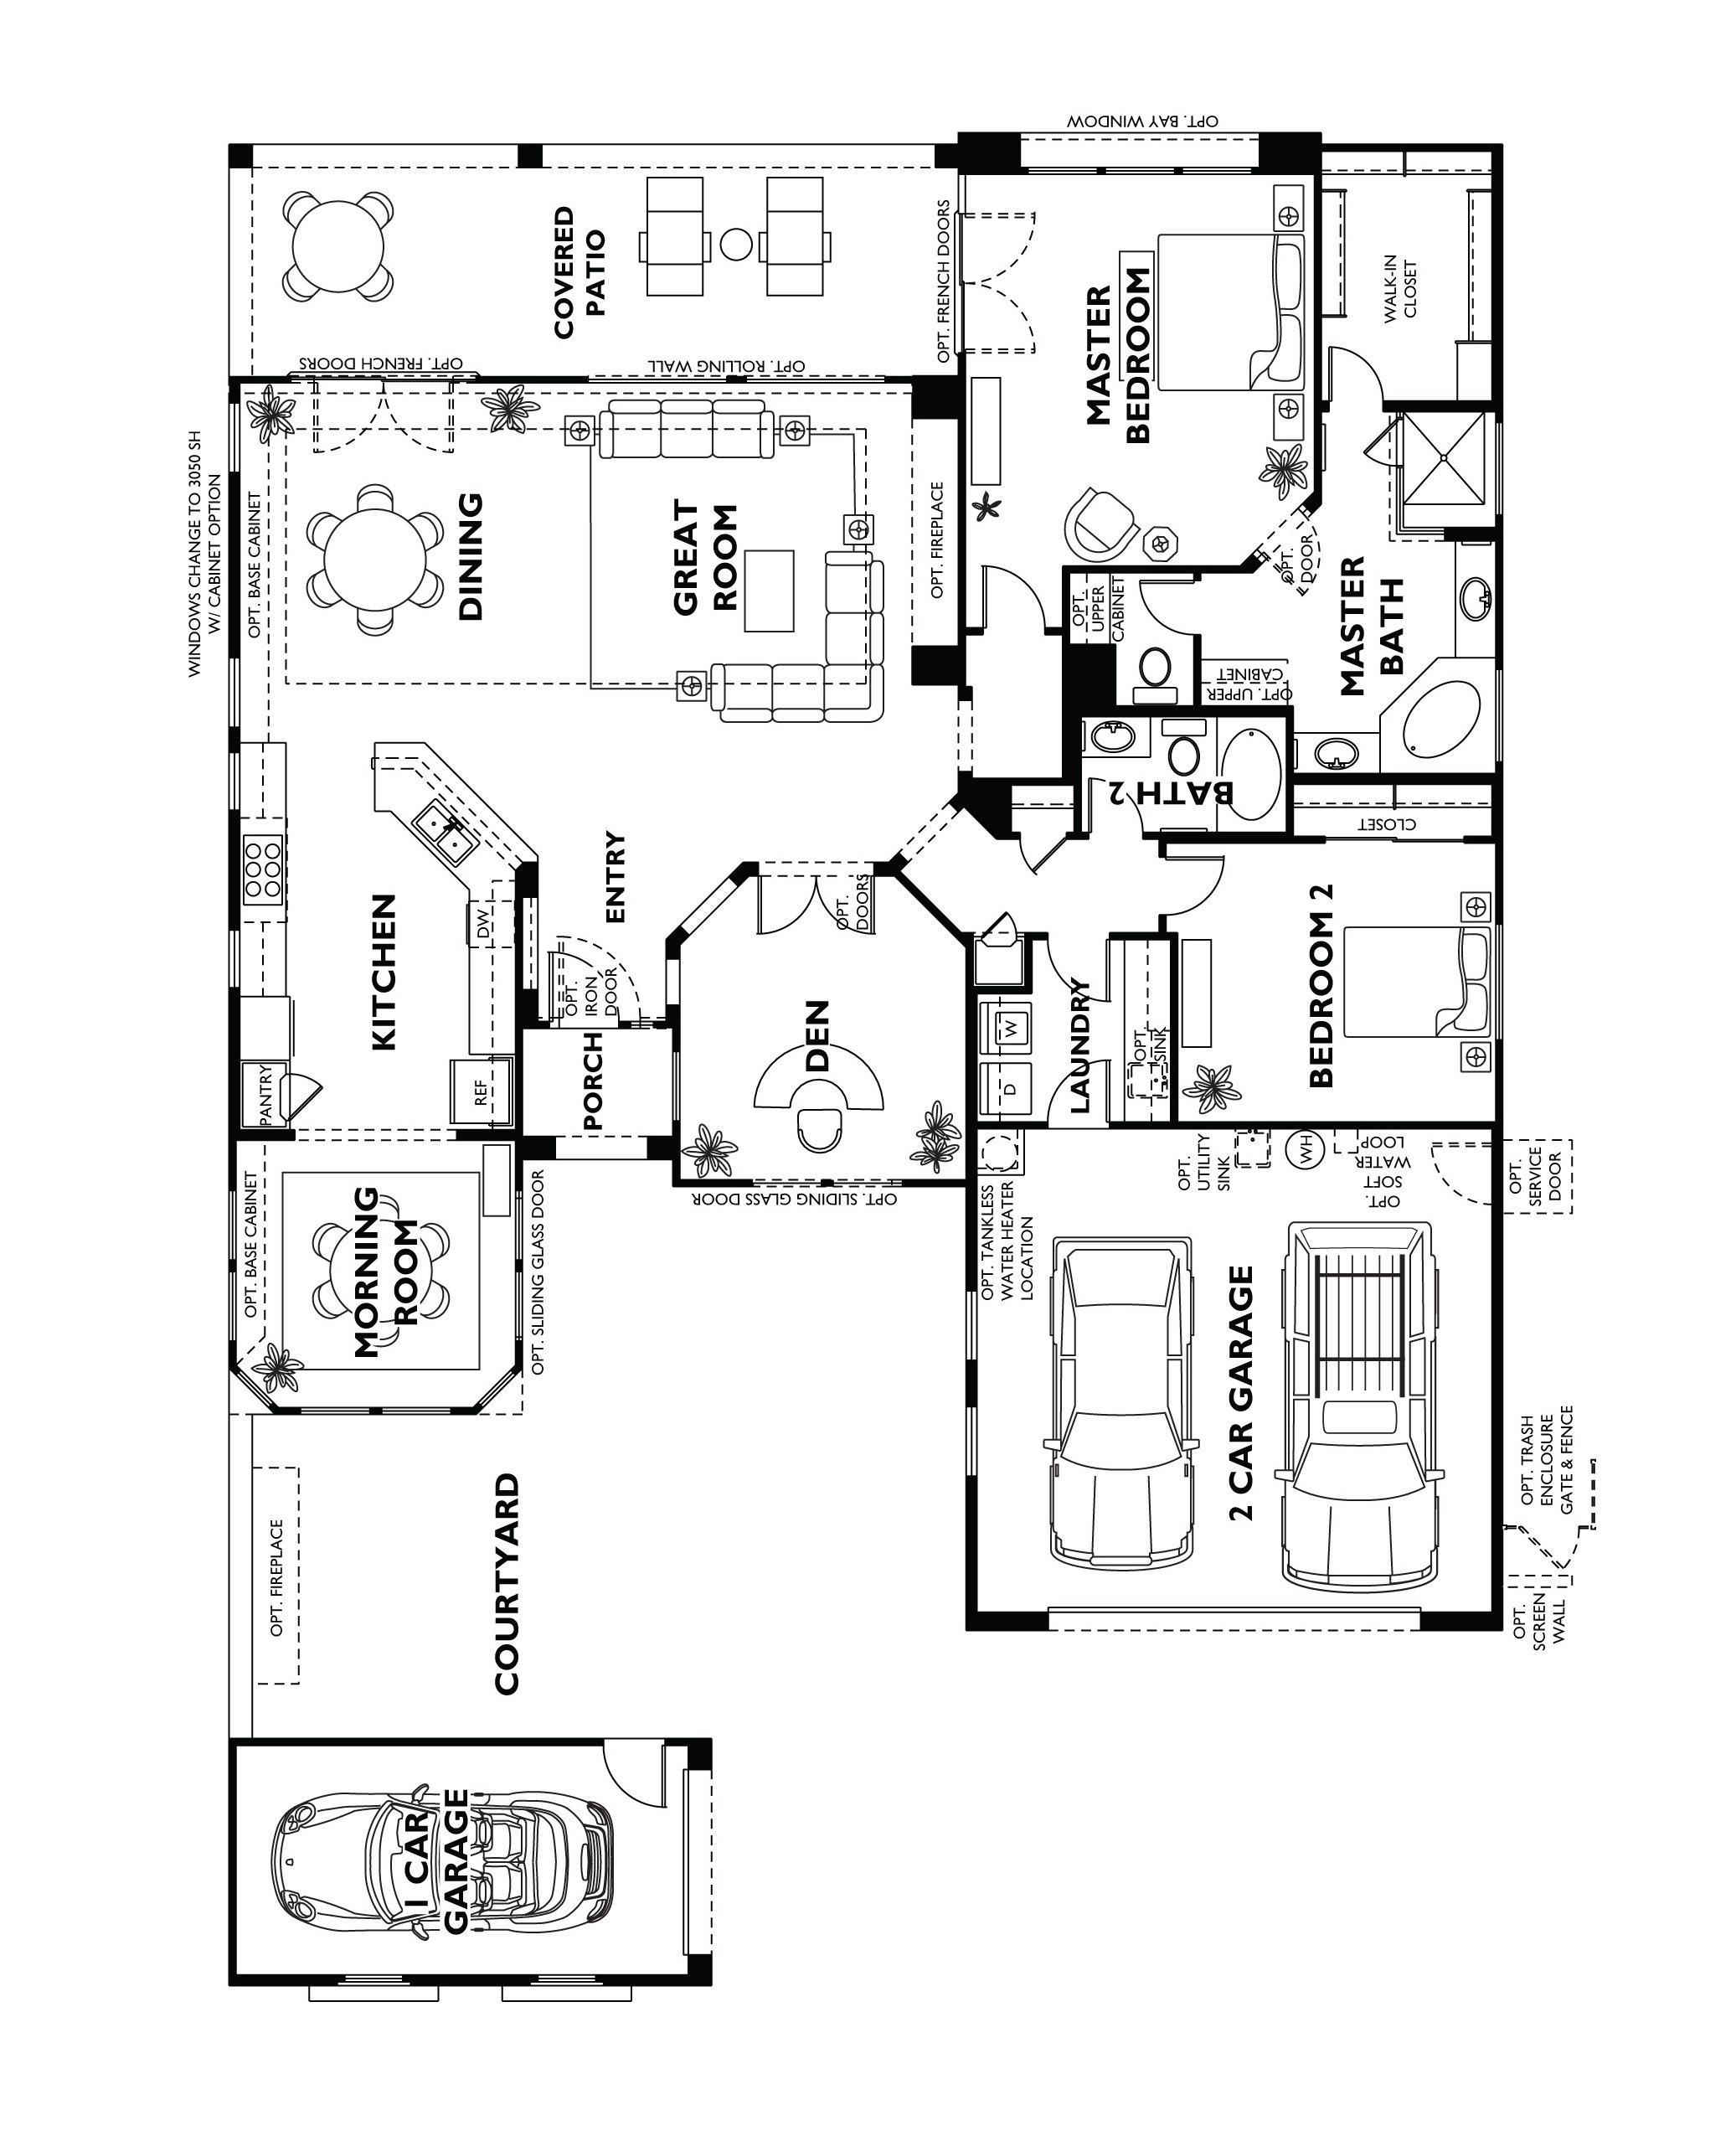 Trilogy at vistancia cadiz floor plan model home